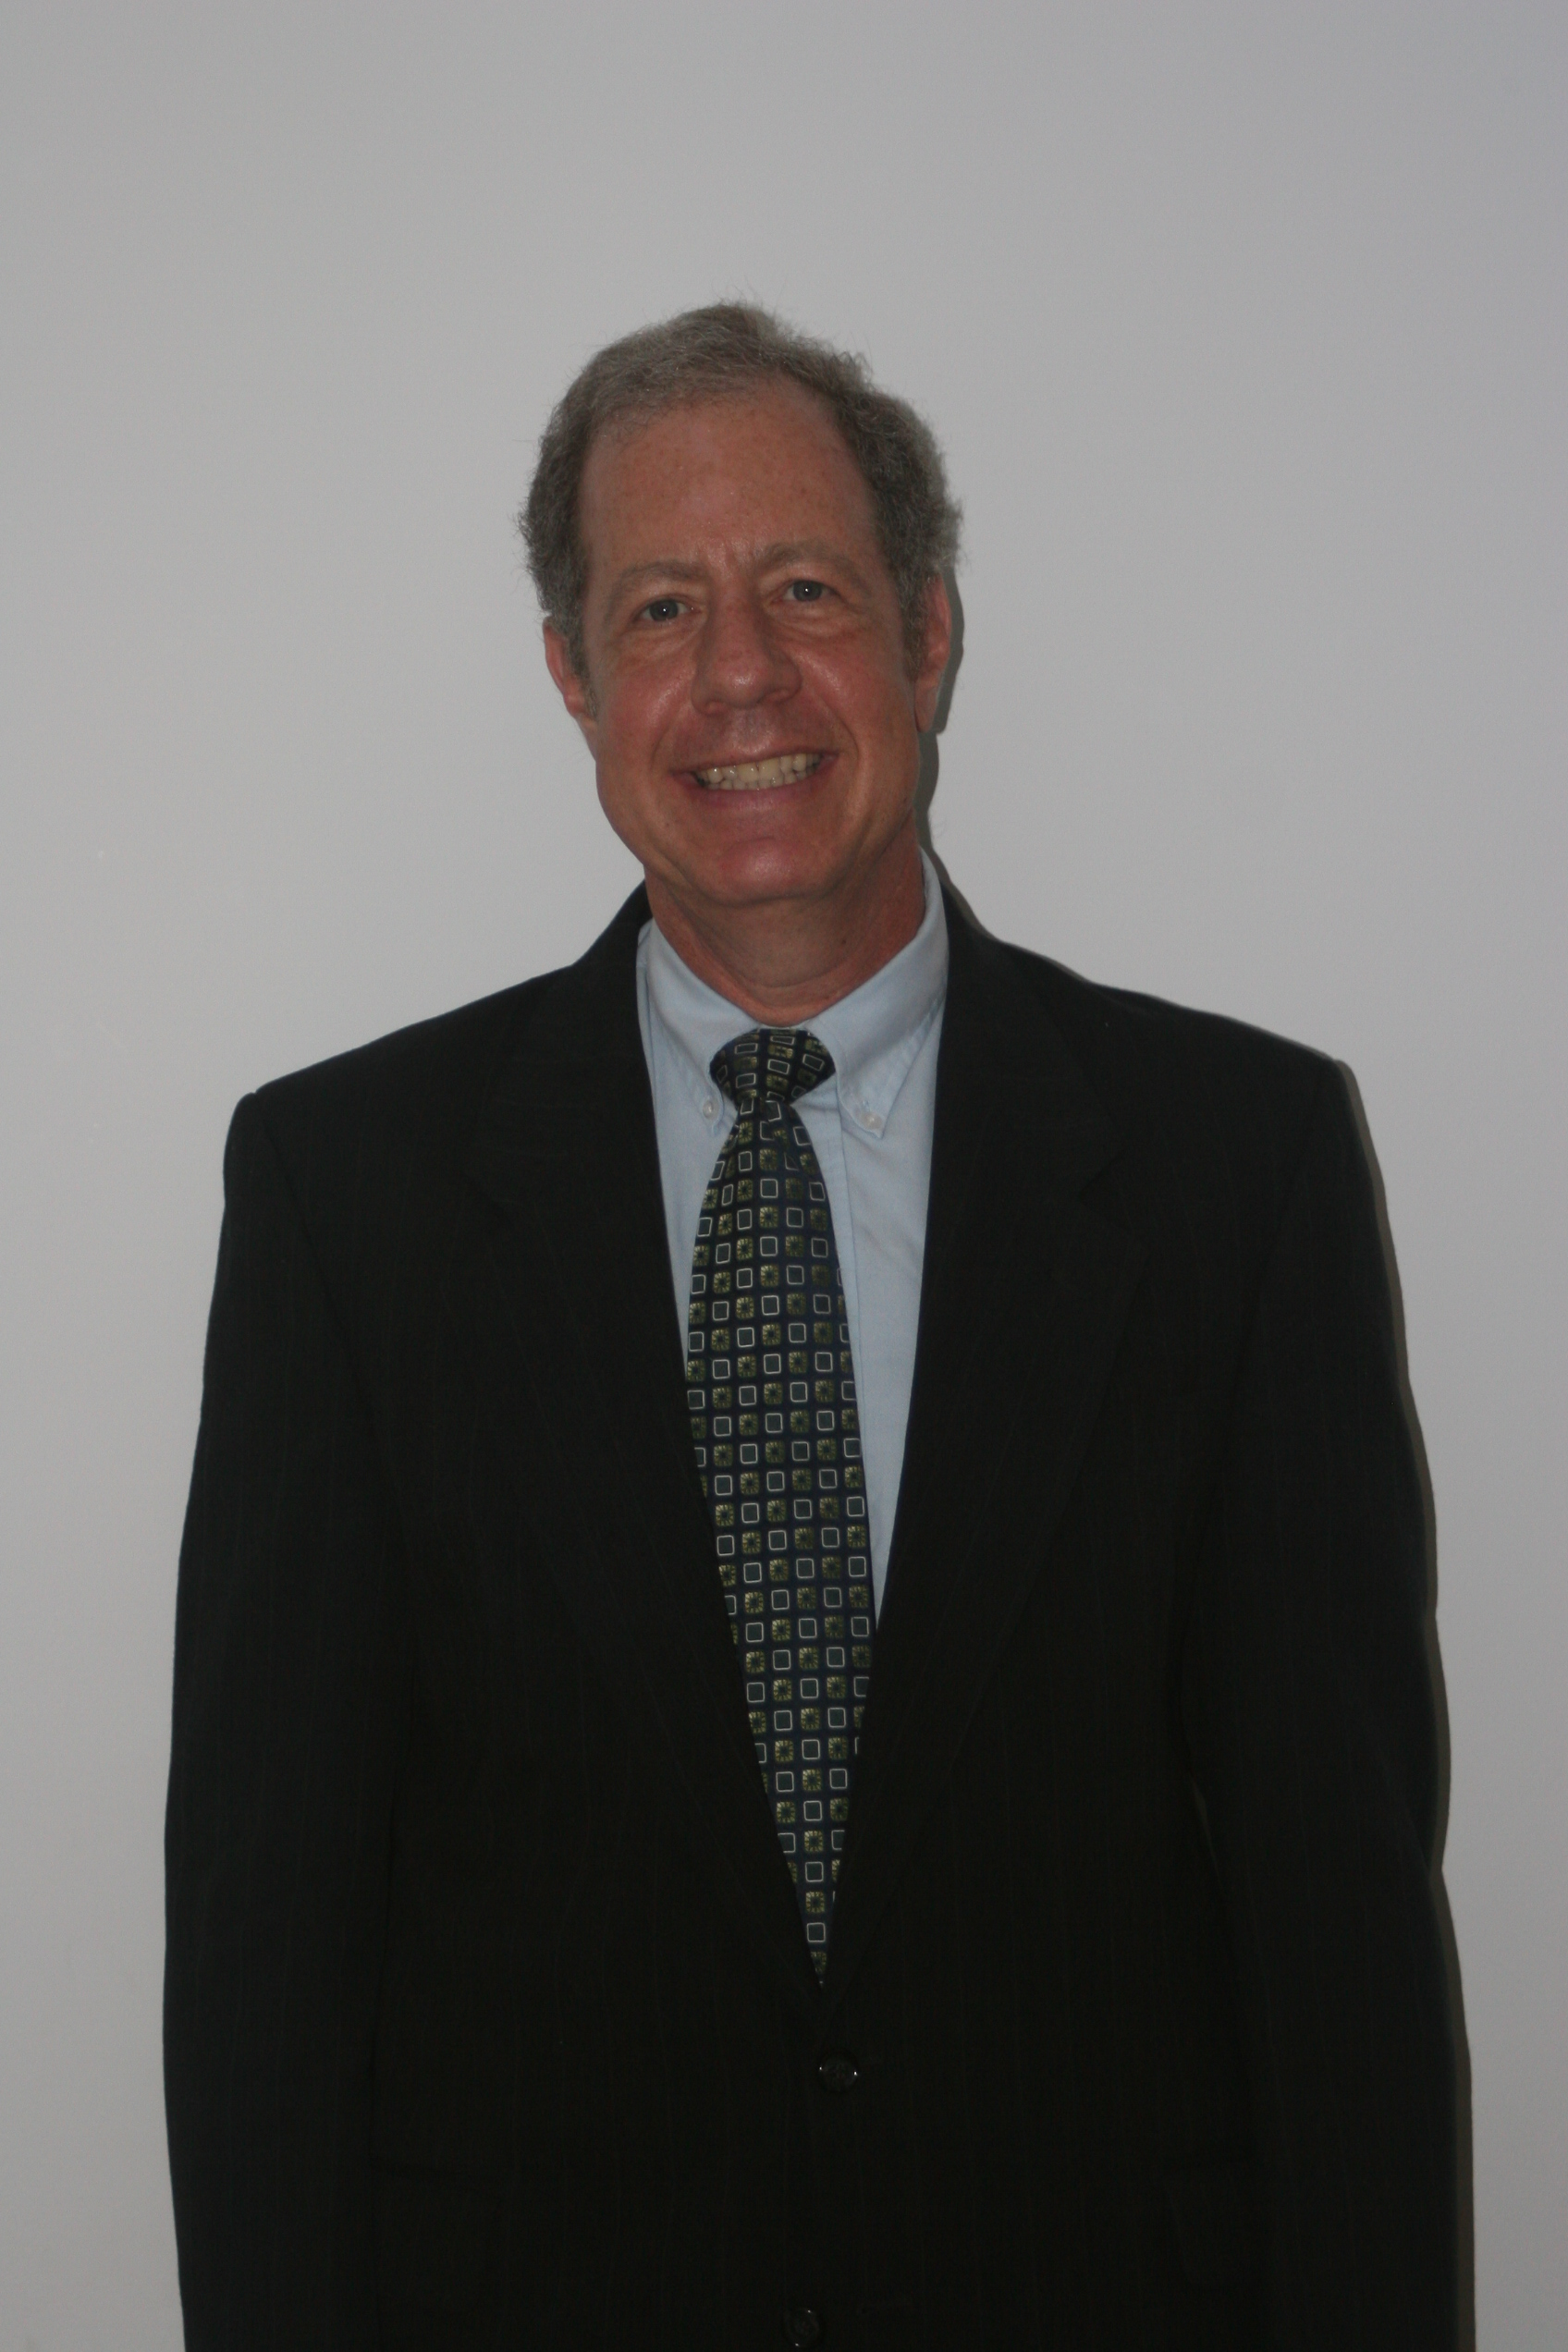 Dr. Terry Lichtor